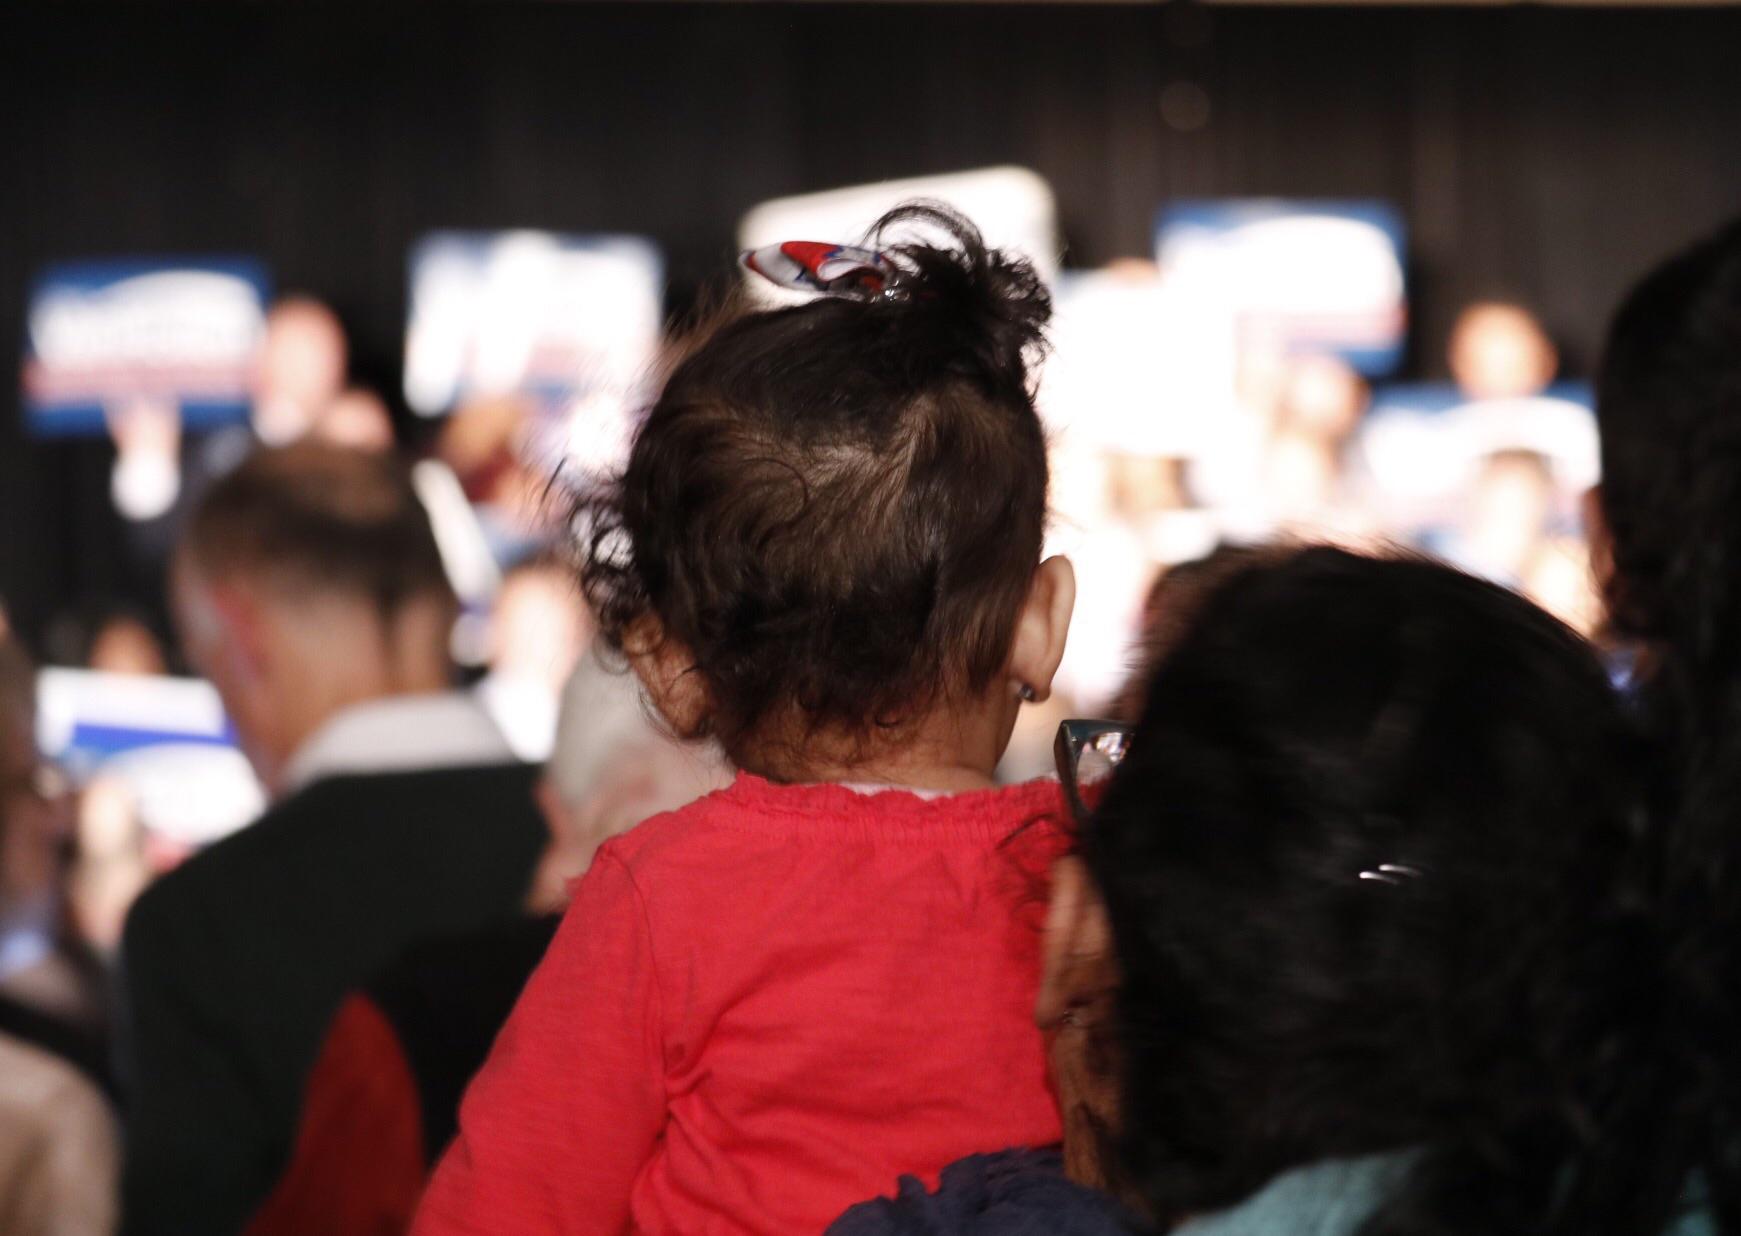 A toddler gets a better view of Van Hollen. (WTOP/Kate Ryan)